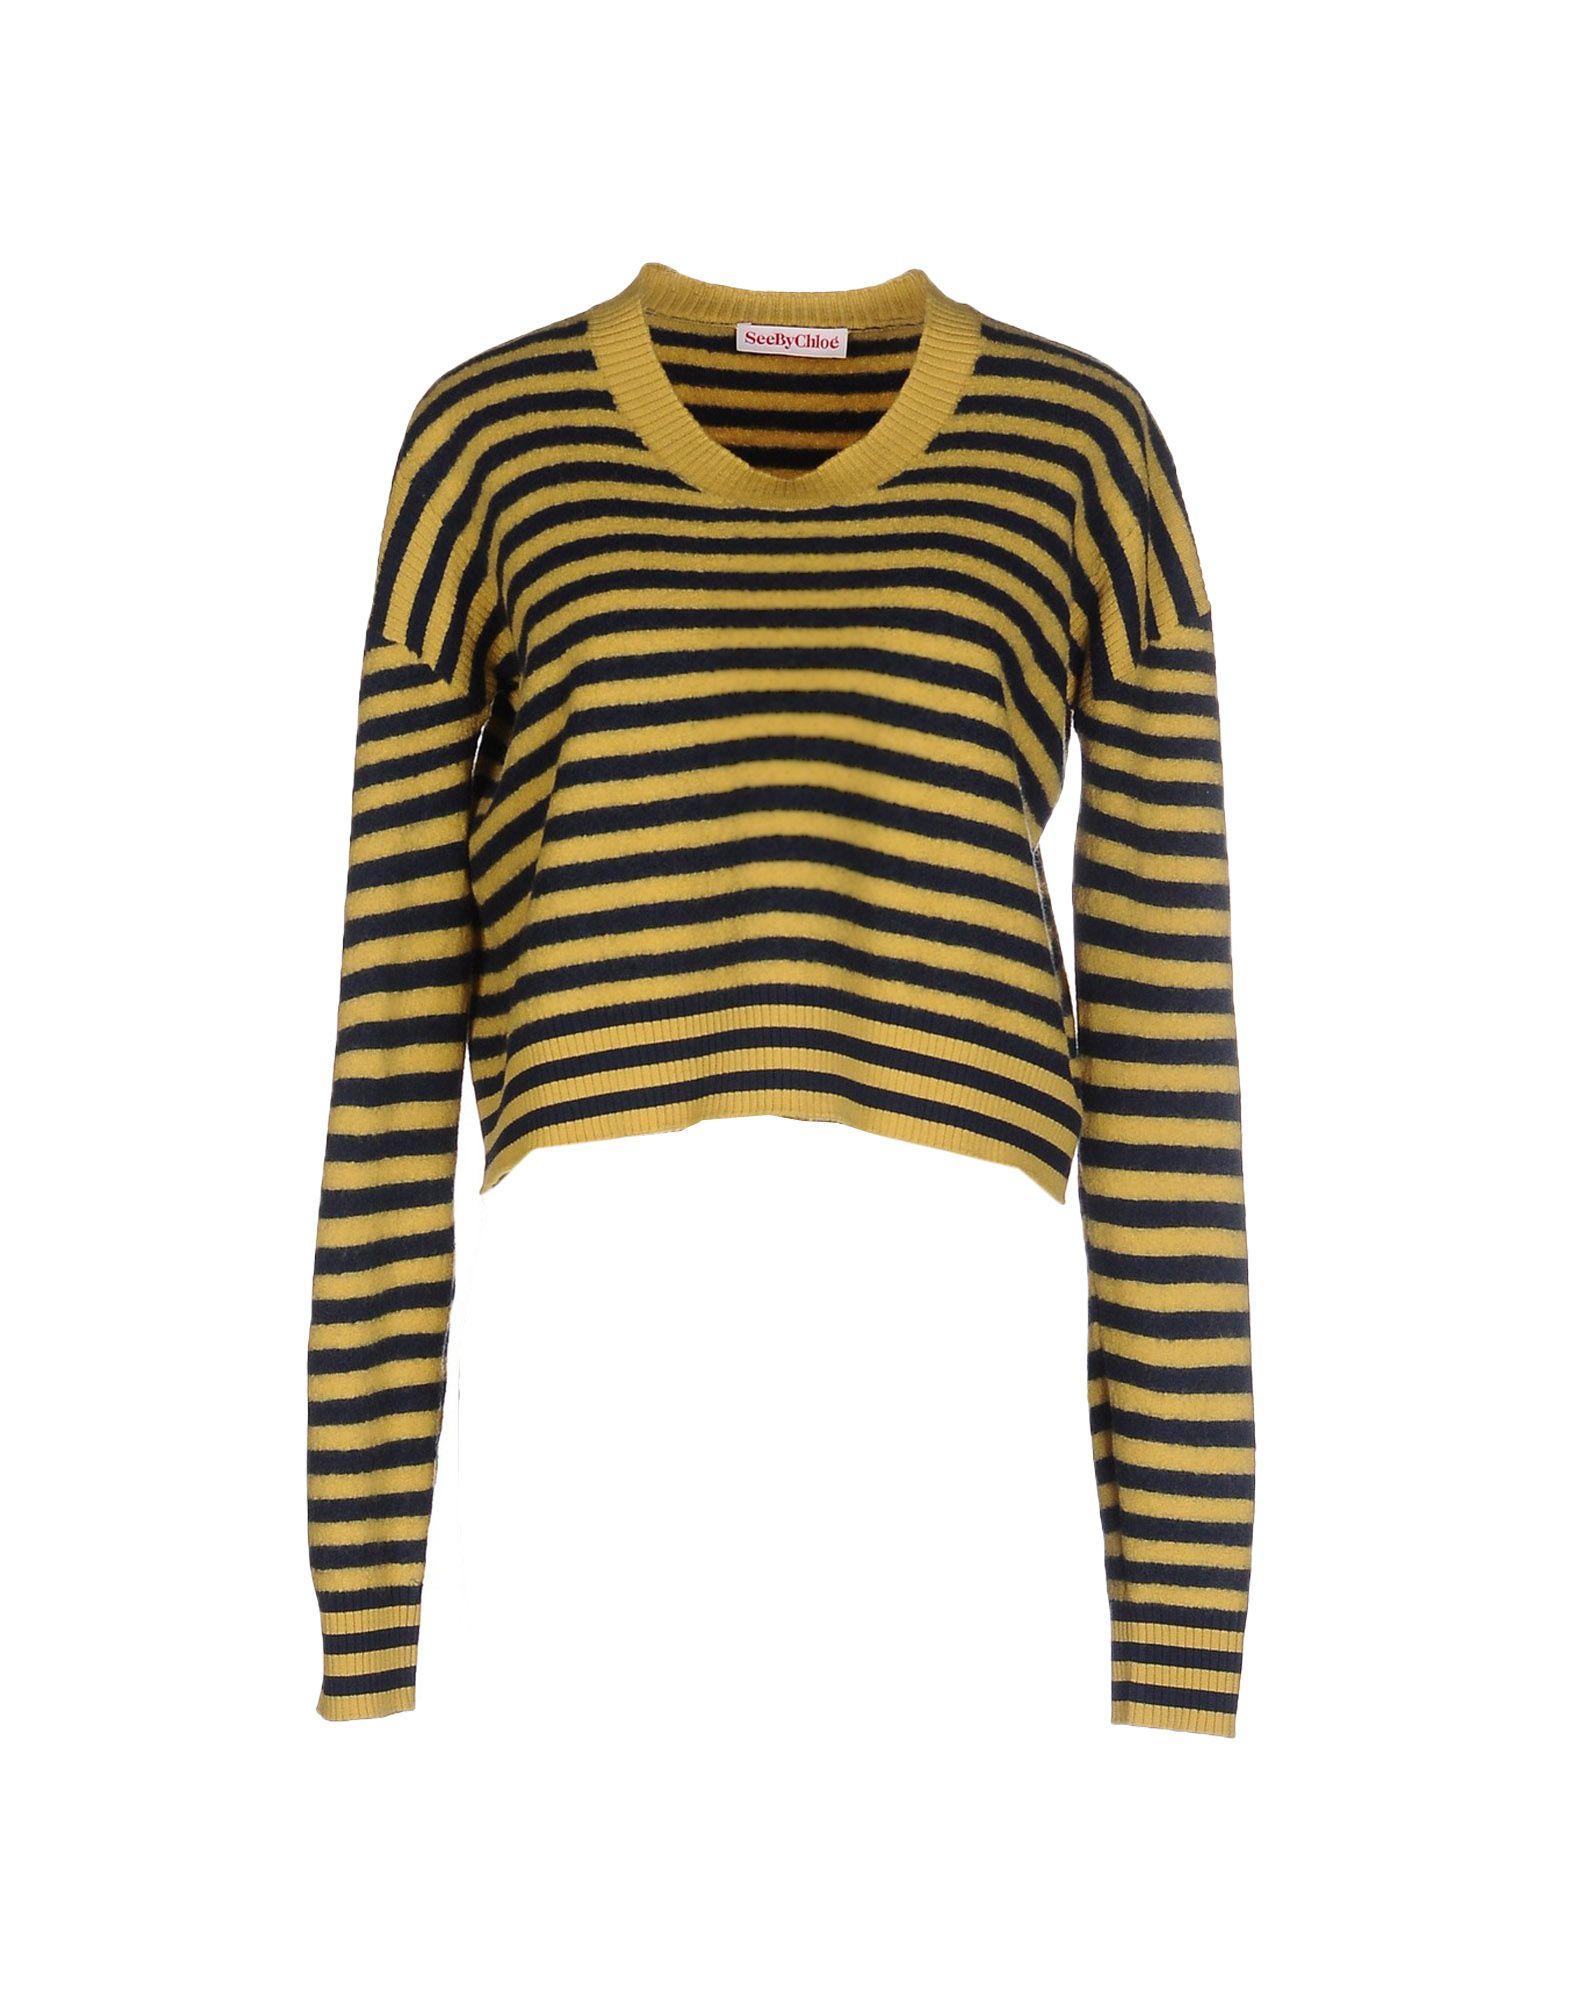 SEE BY CHLOÉ Damen Pullover Farbe Ocker Größe 7